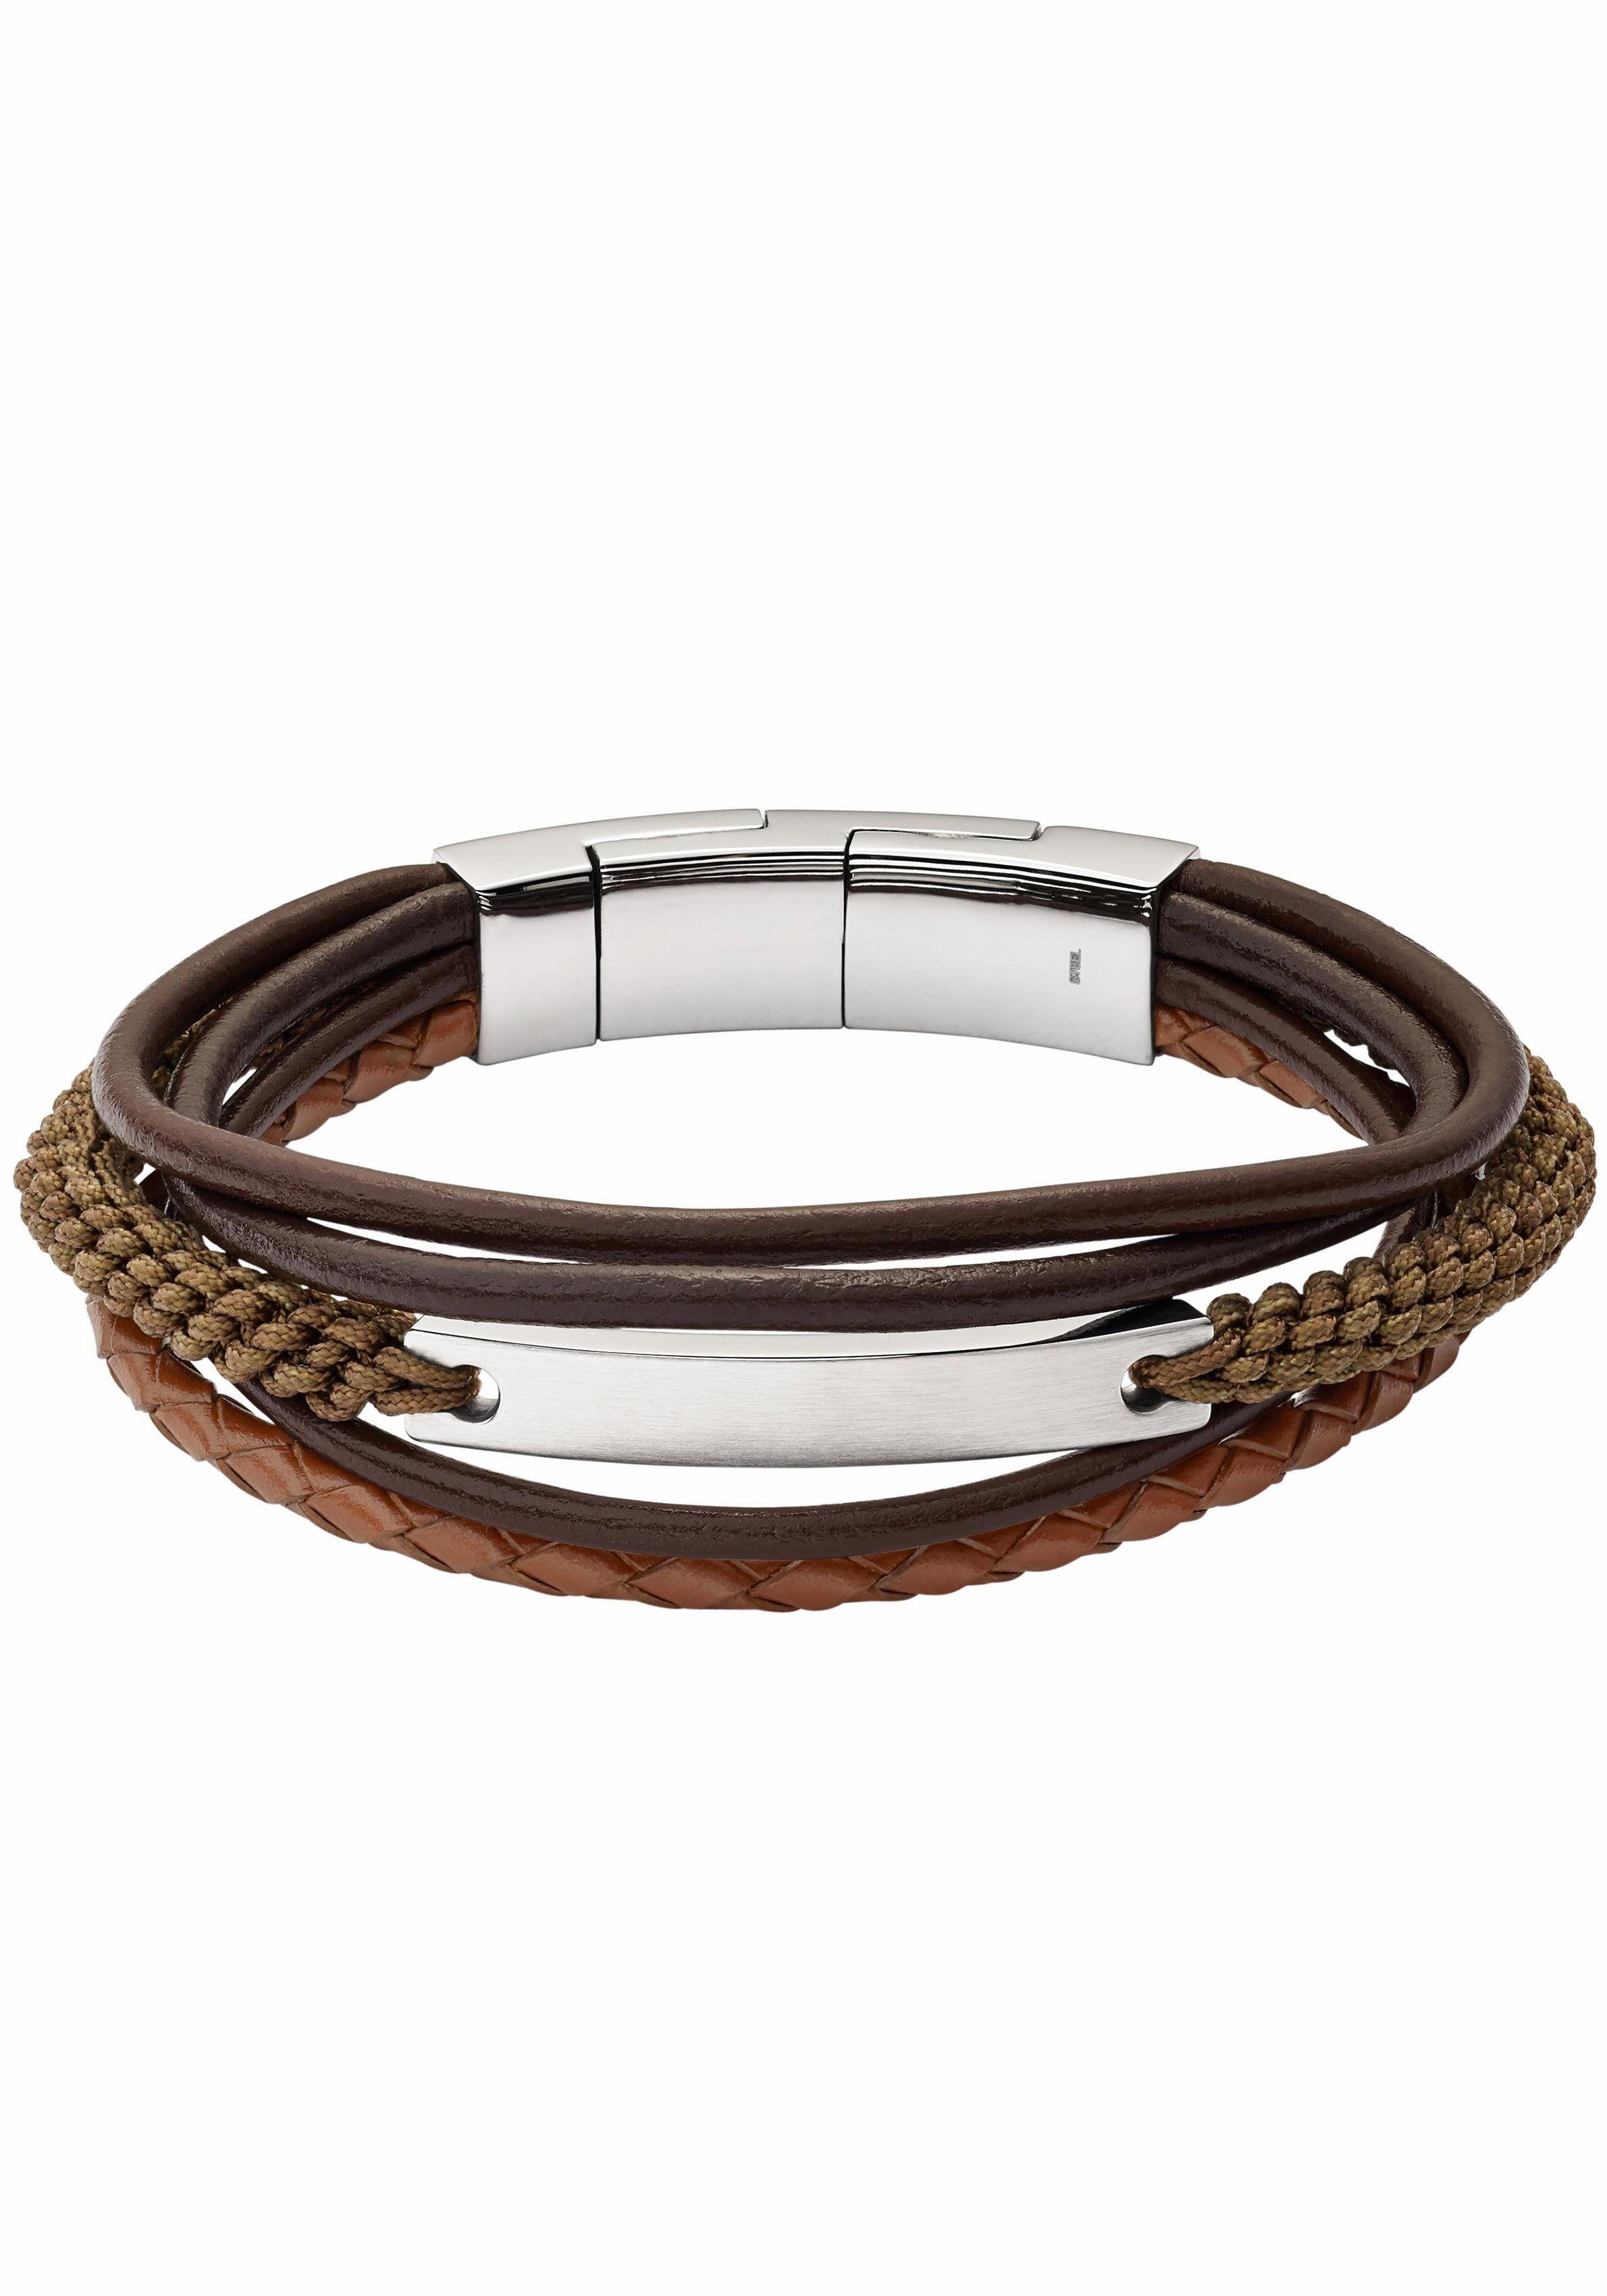 Herren Fossil Armband Mens Classics Jf02703040 Braun 04053858899933 Mode Ootd Outfit Fashion Style Onli Manner Armband Armband Armband Leder